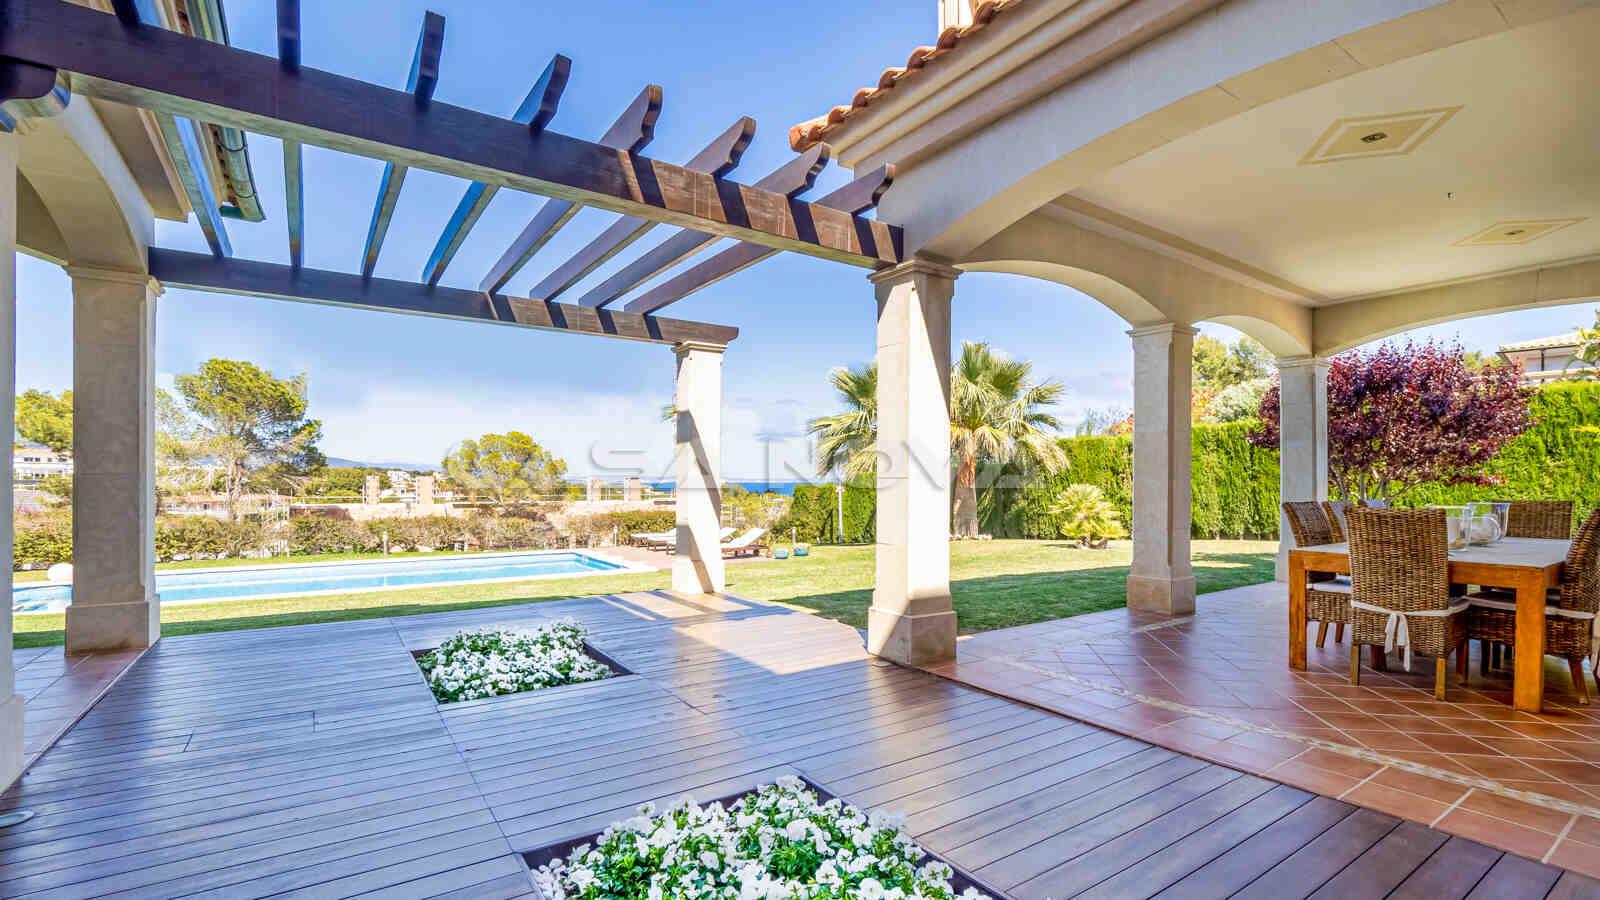 Traumhafte Mallorca Villa mit wundervollem Ausblick